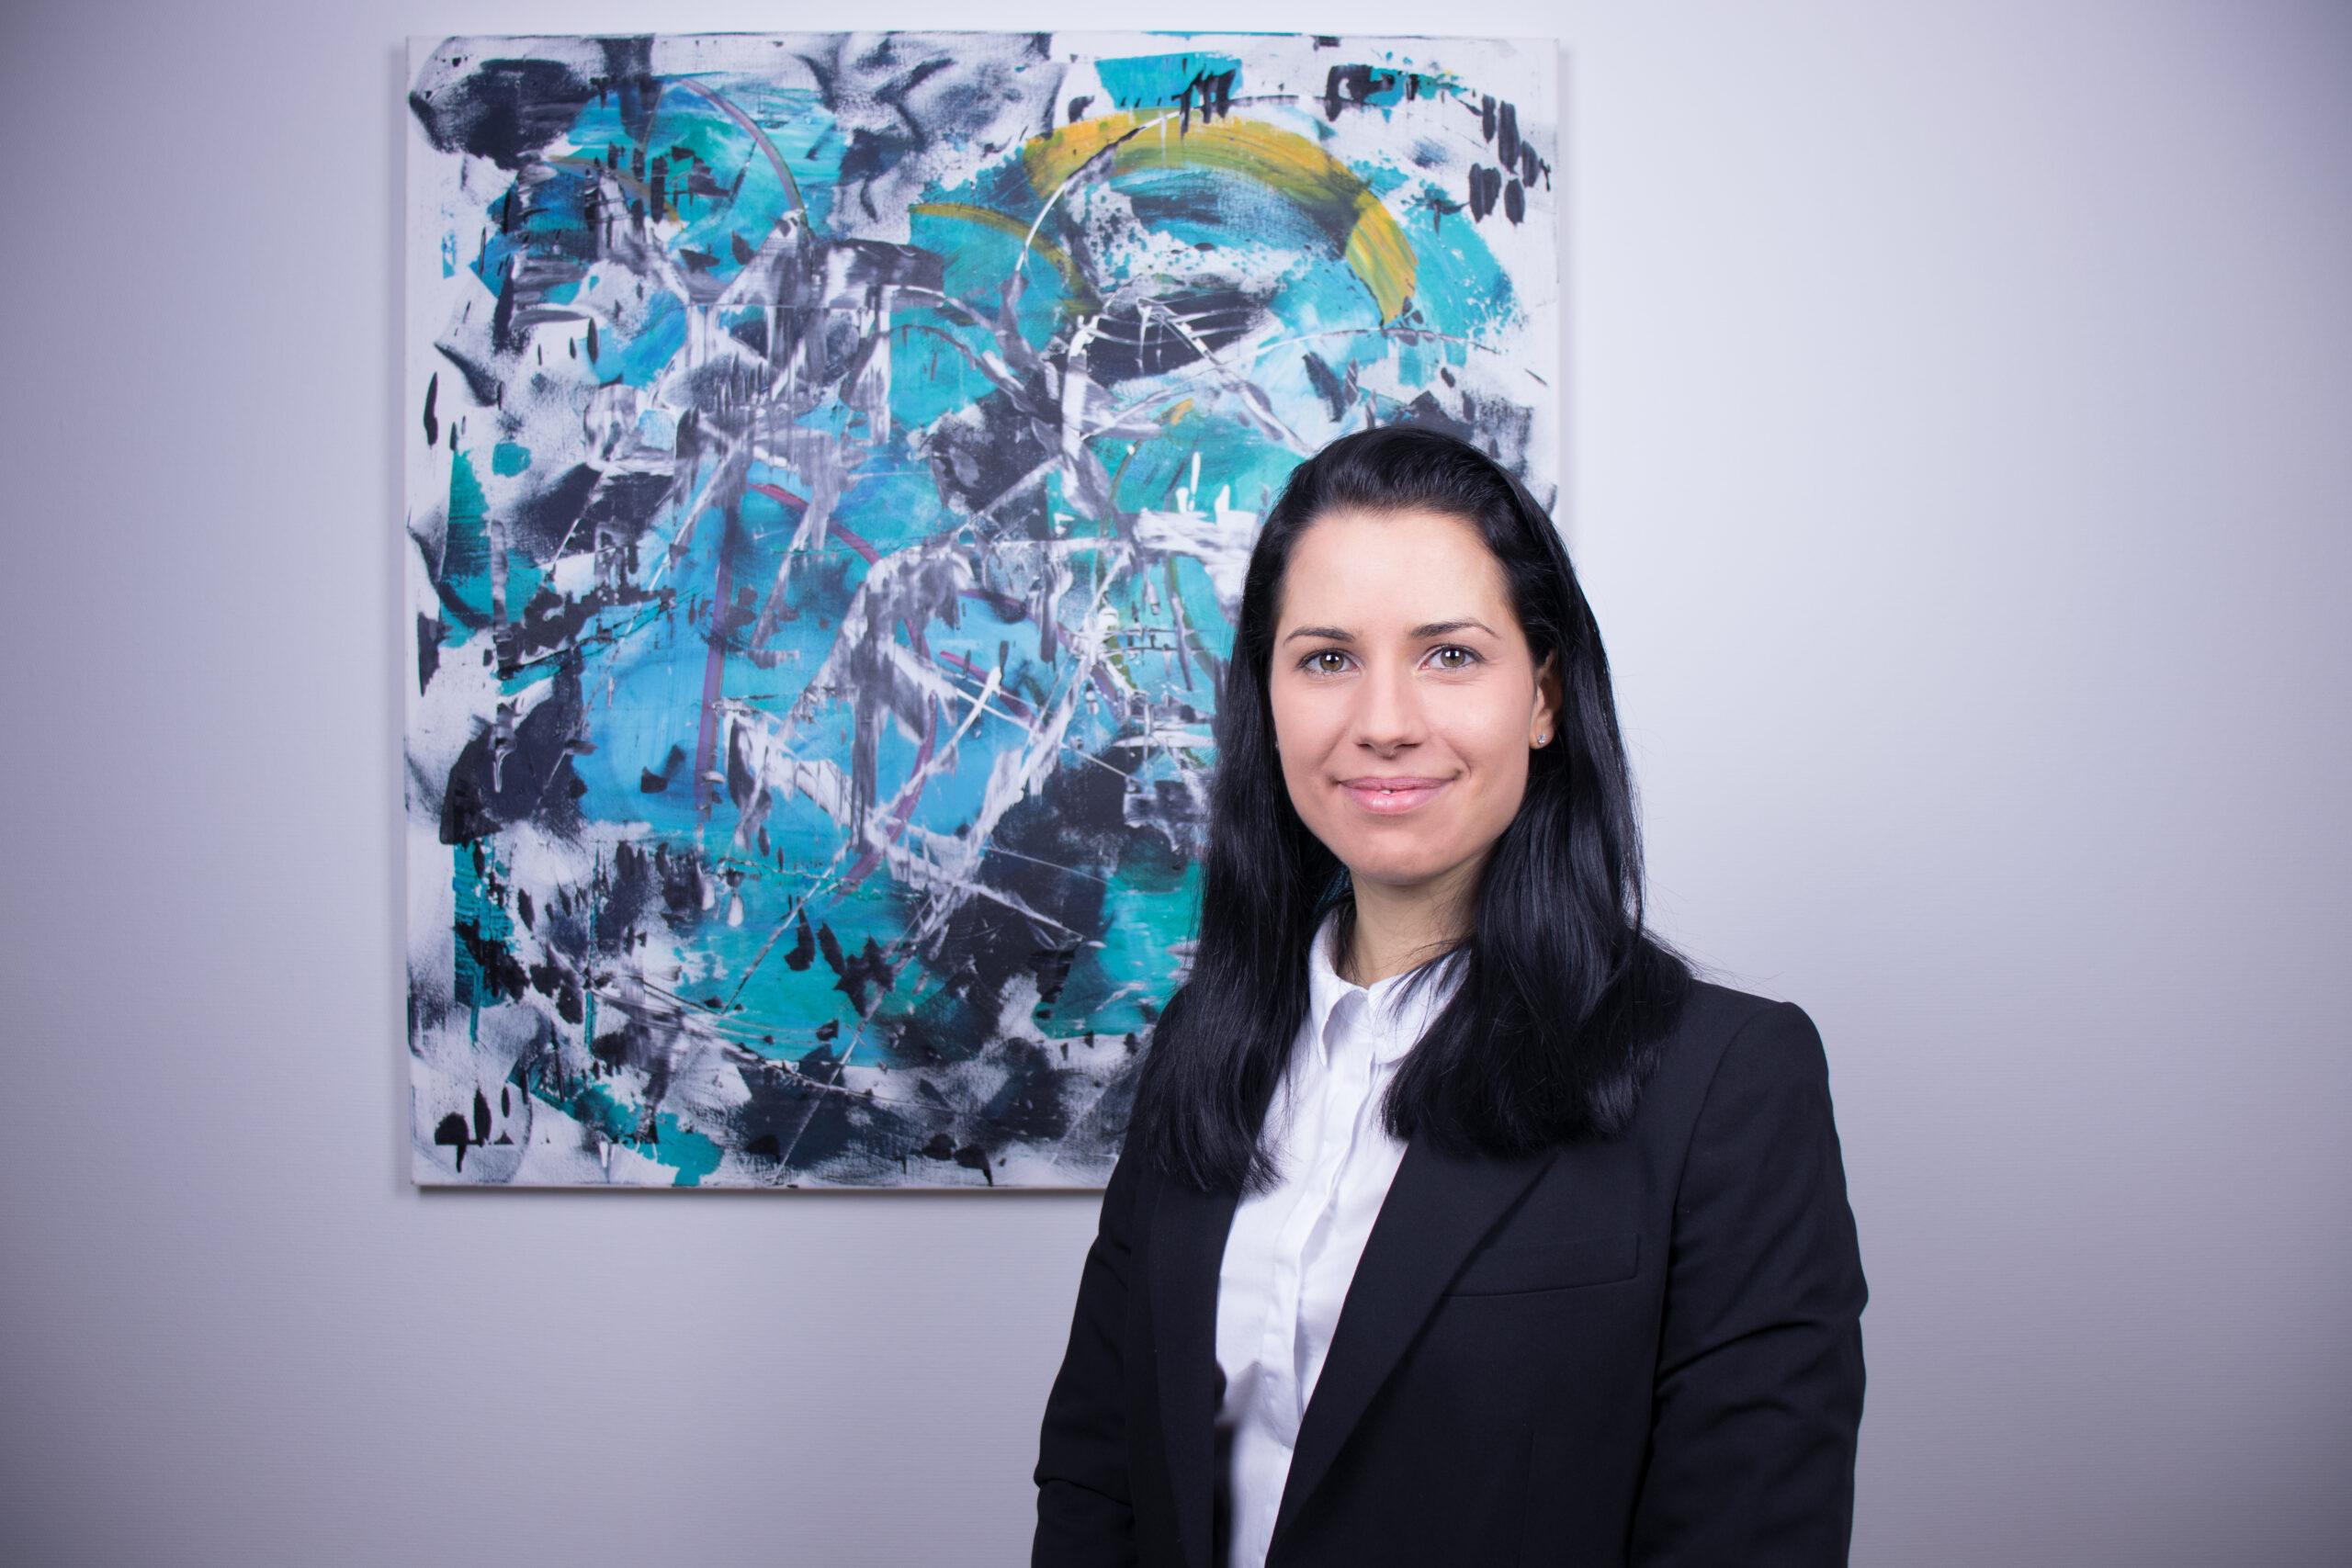 Martina Hunziker